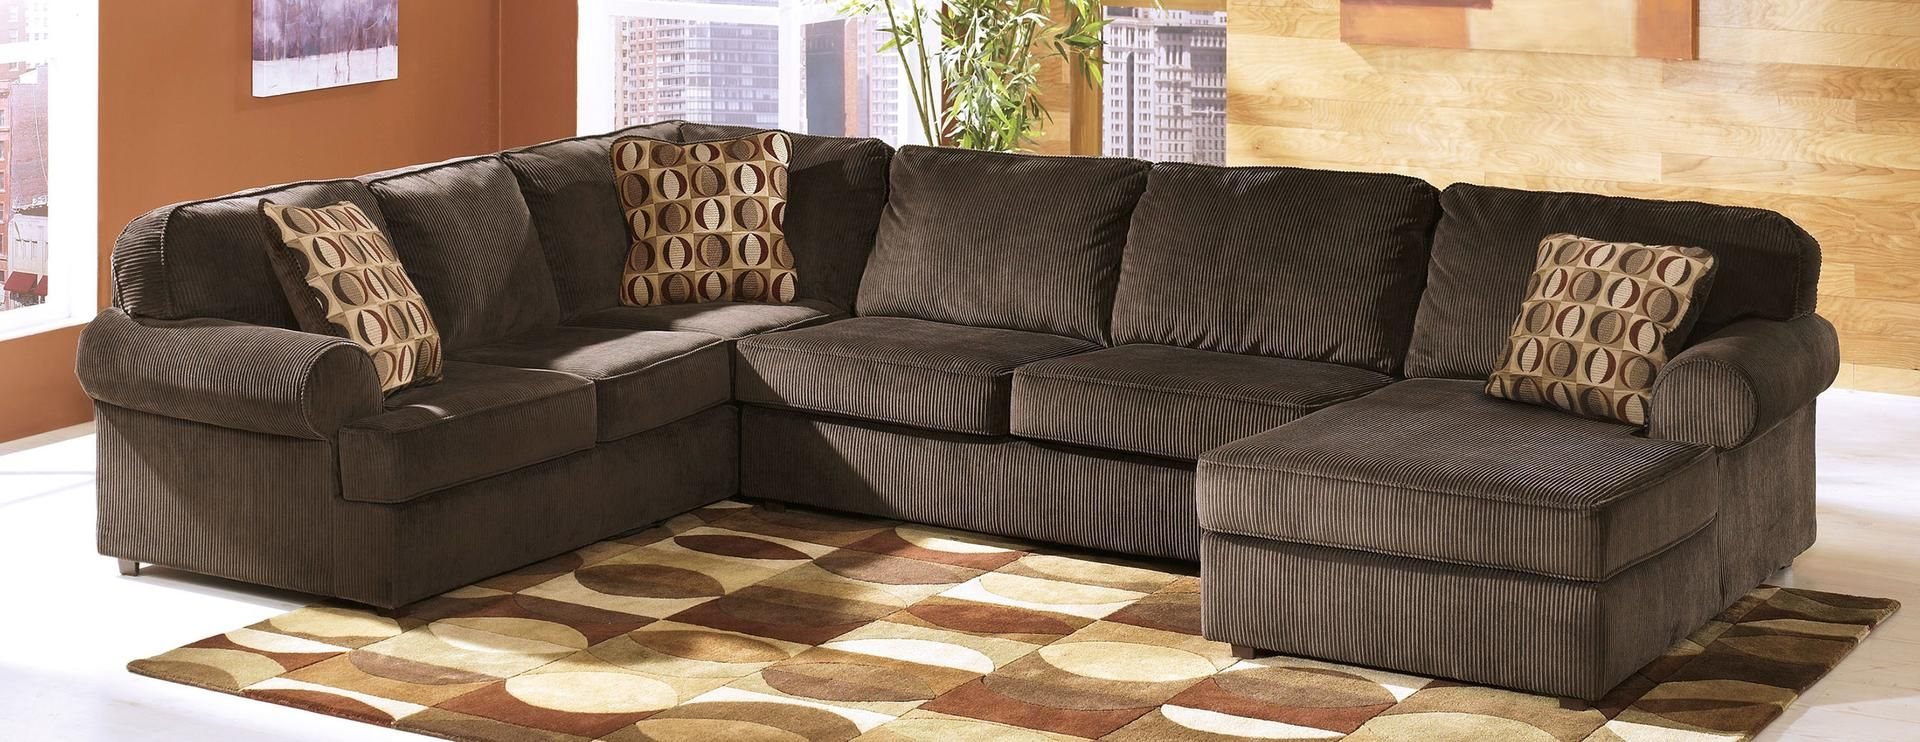 Ashley 68404173466 Vista Series Stationary Fabric Sofa 3 Piece